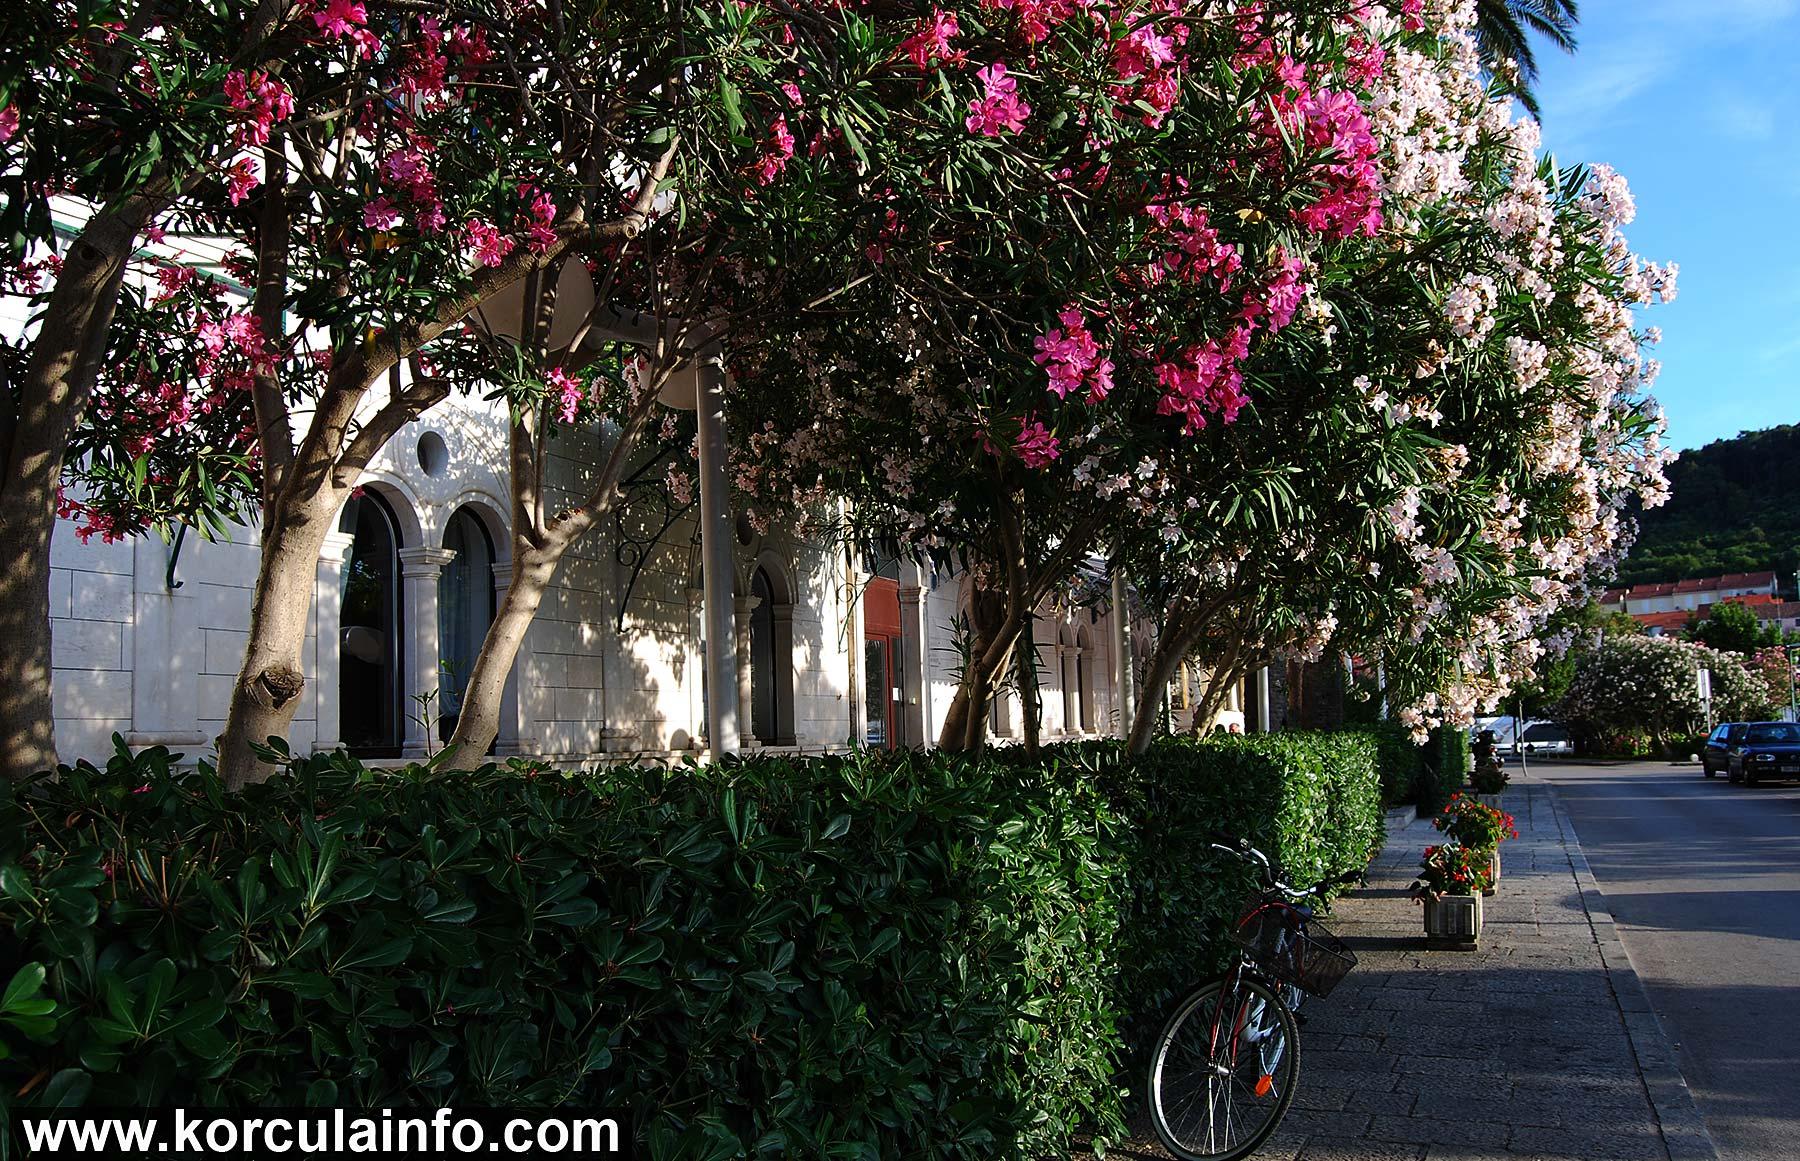 Passing by Hotel Korcula De La Ville